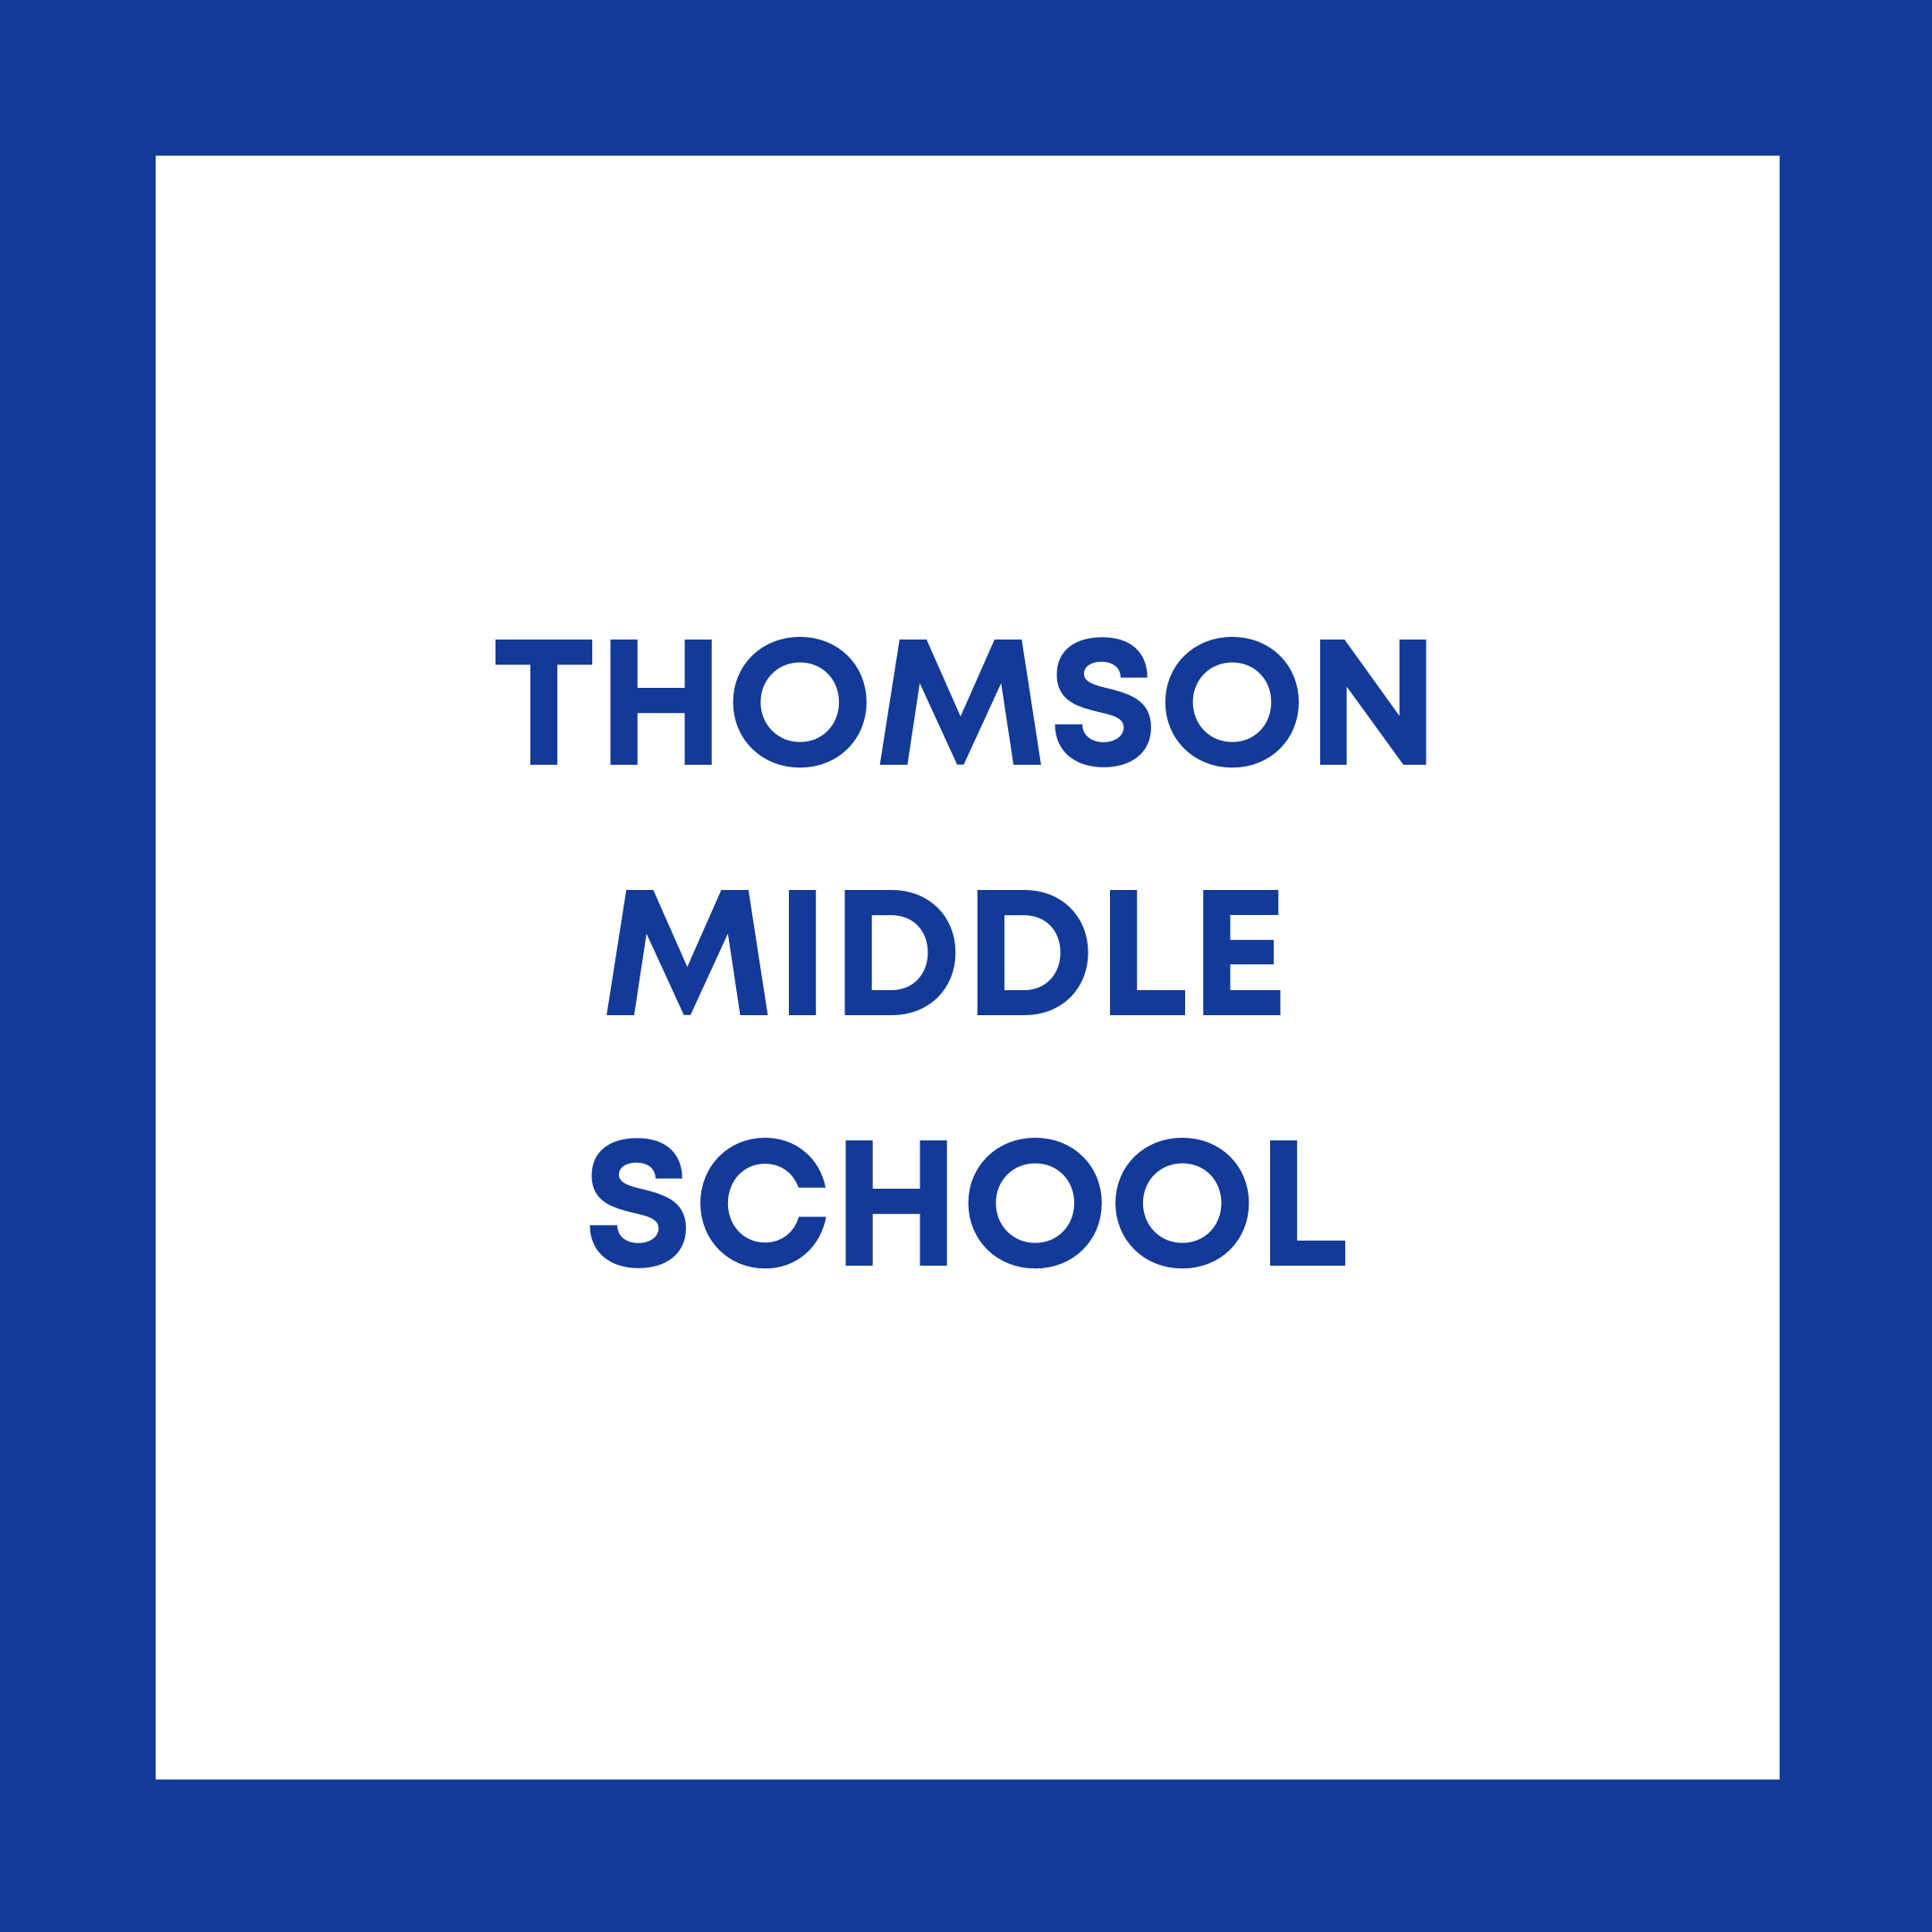 Thomson Middle School